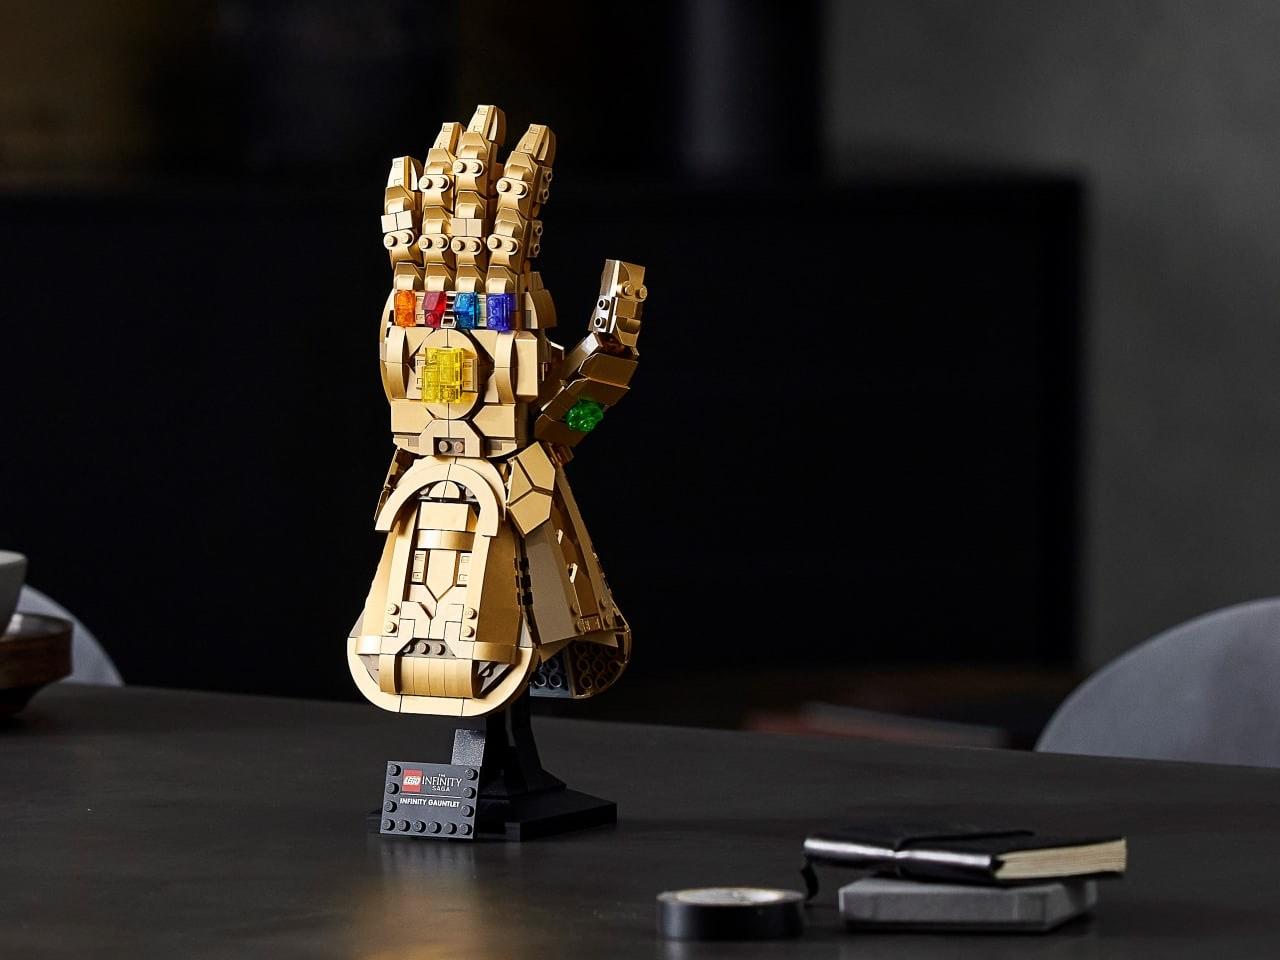 Lego Marvel Infinity Gauntlet